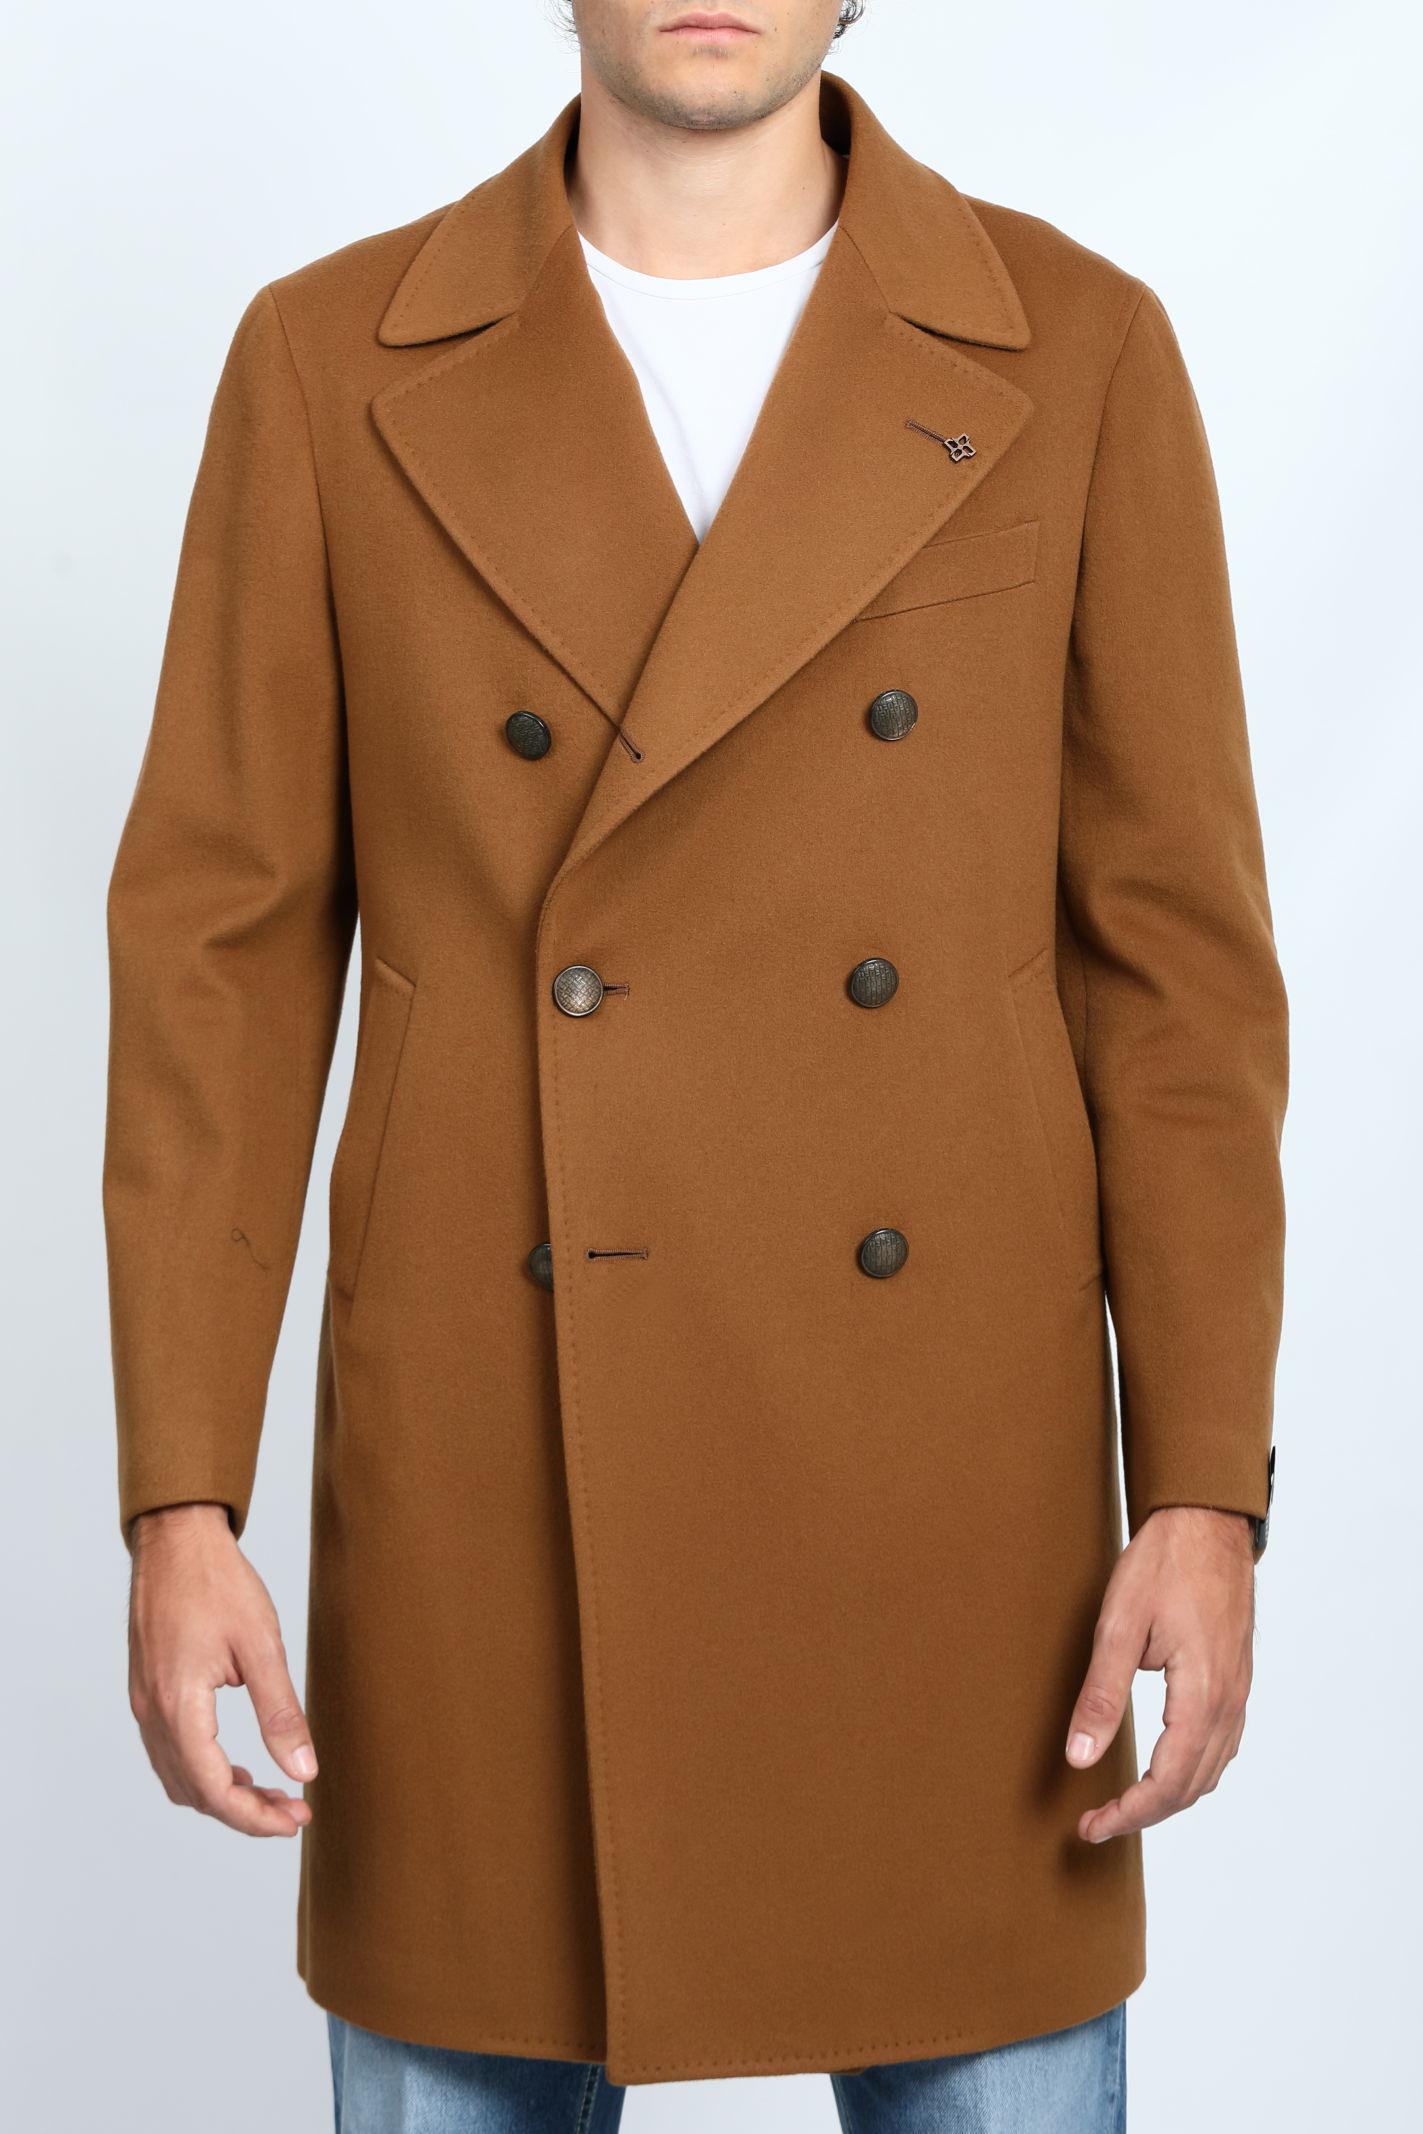 CACHEMIRE BLEND COAT TAGLIATORE   Coats   ARDEN-TRP-350001K3436